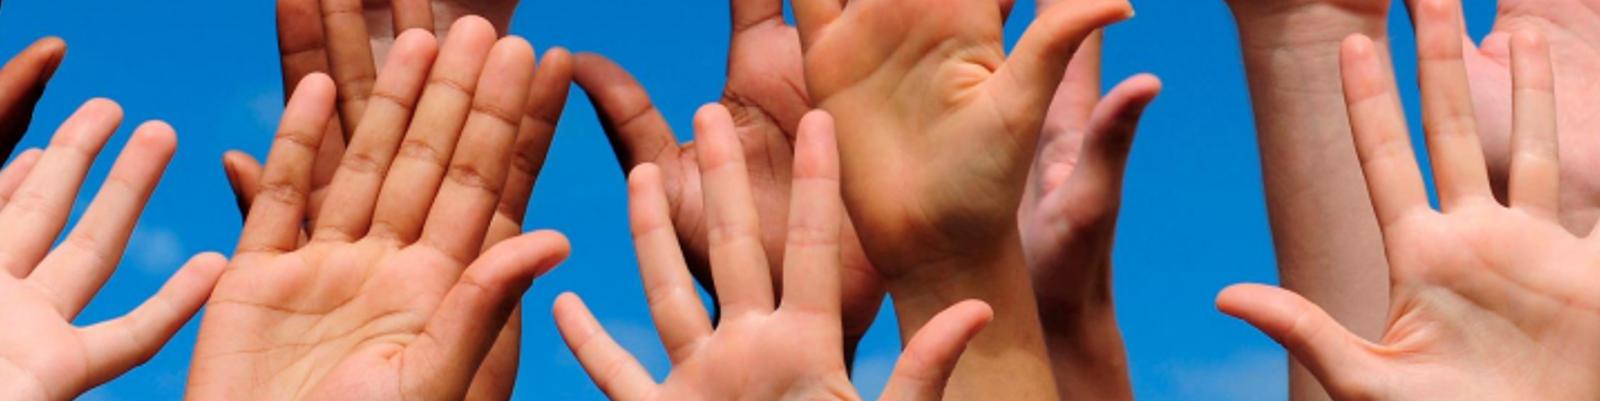 slide:Initiatives for a Stronger Community